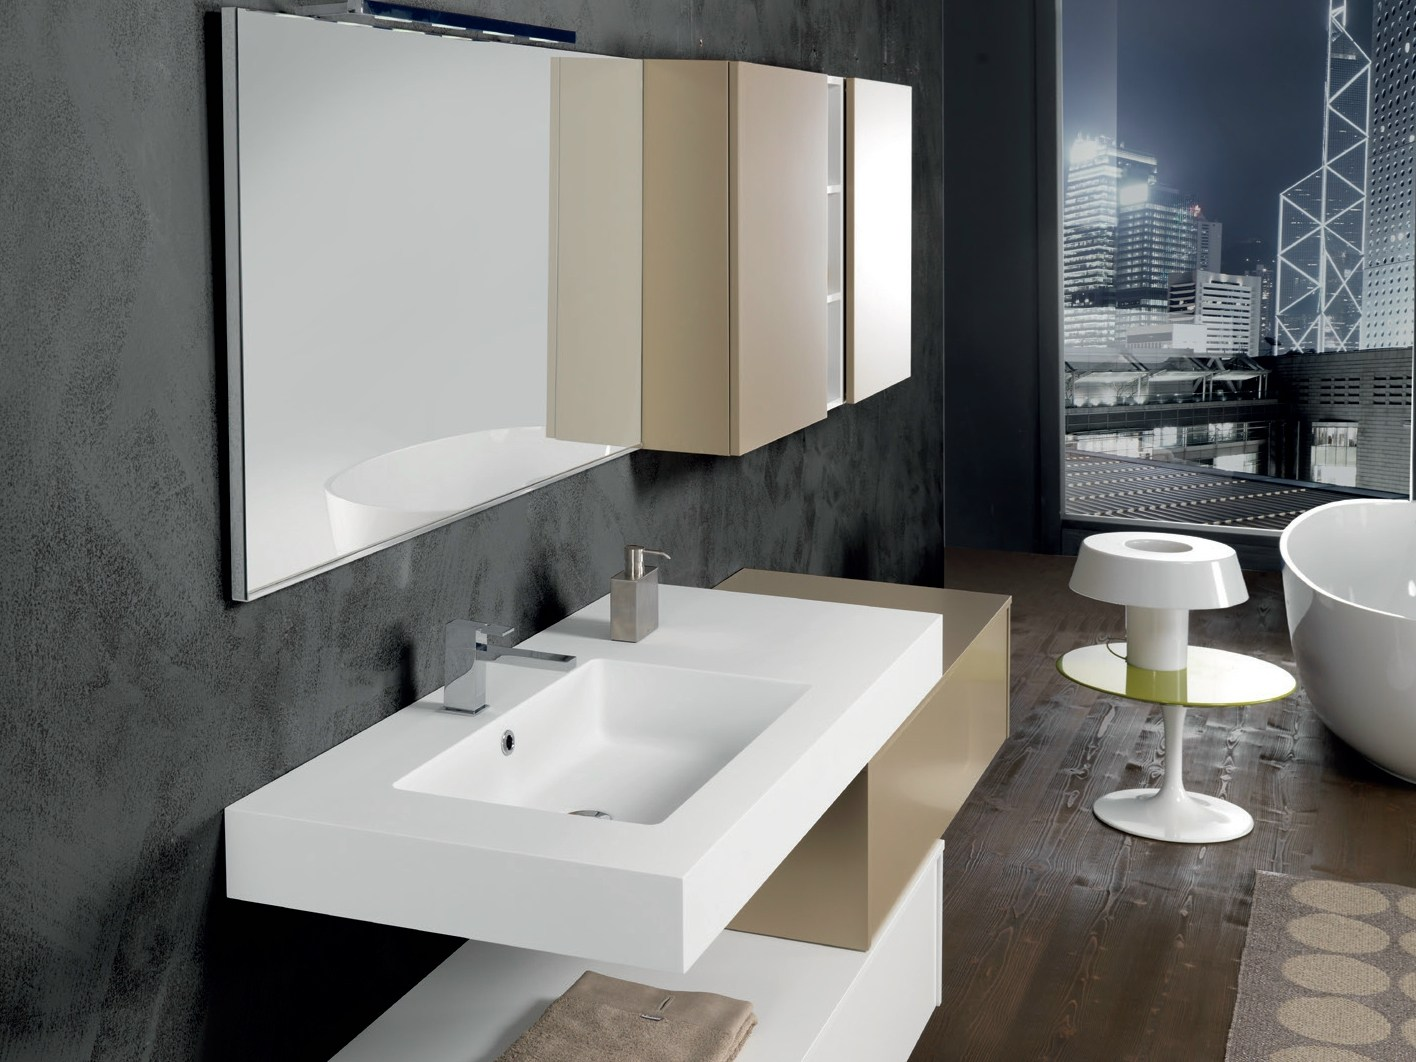 Mobile lavabo laccato sospeso con armadio v65 by mobiltesino for Bagno arredo design